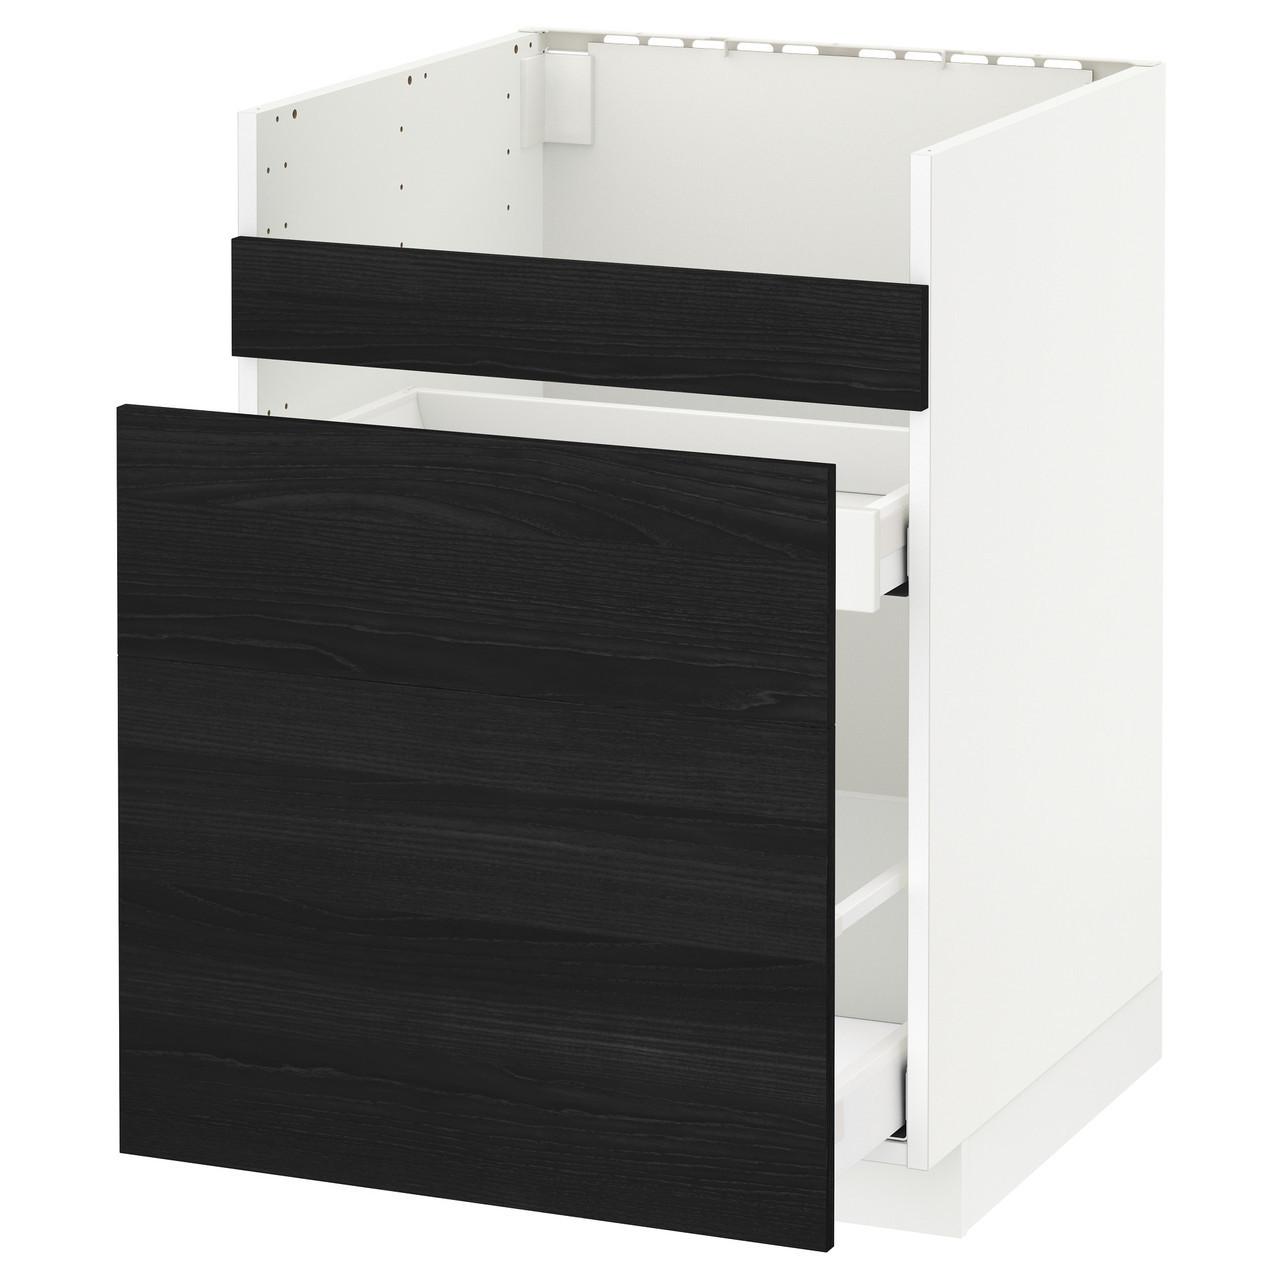 Тумба под раковину IKEA METOD HAVSEN Maximera Tingsryd черная белая 492.804.81